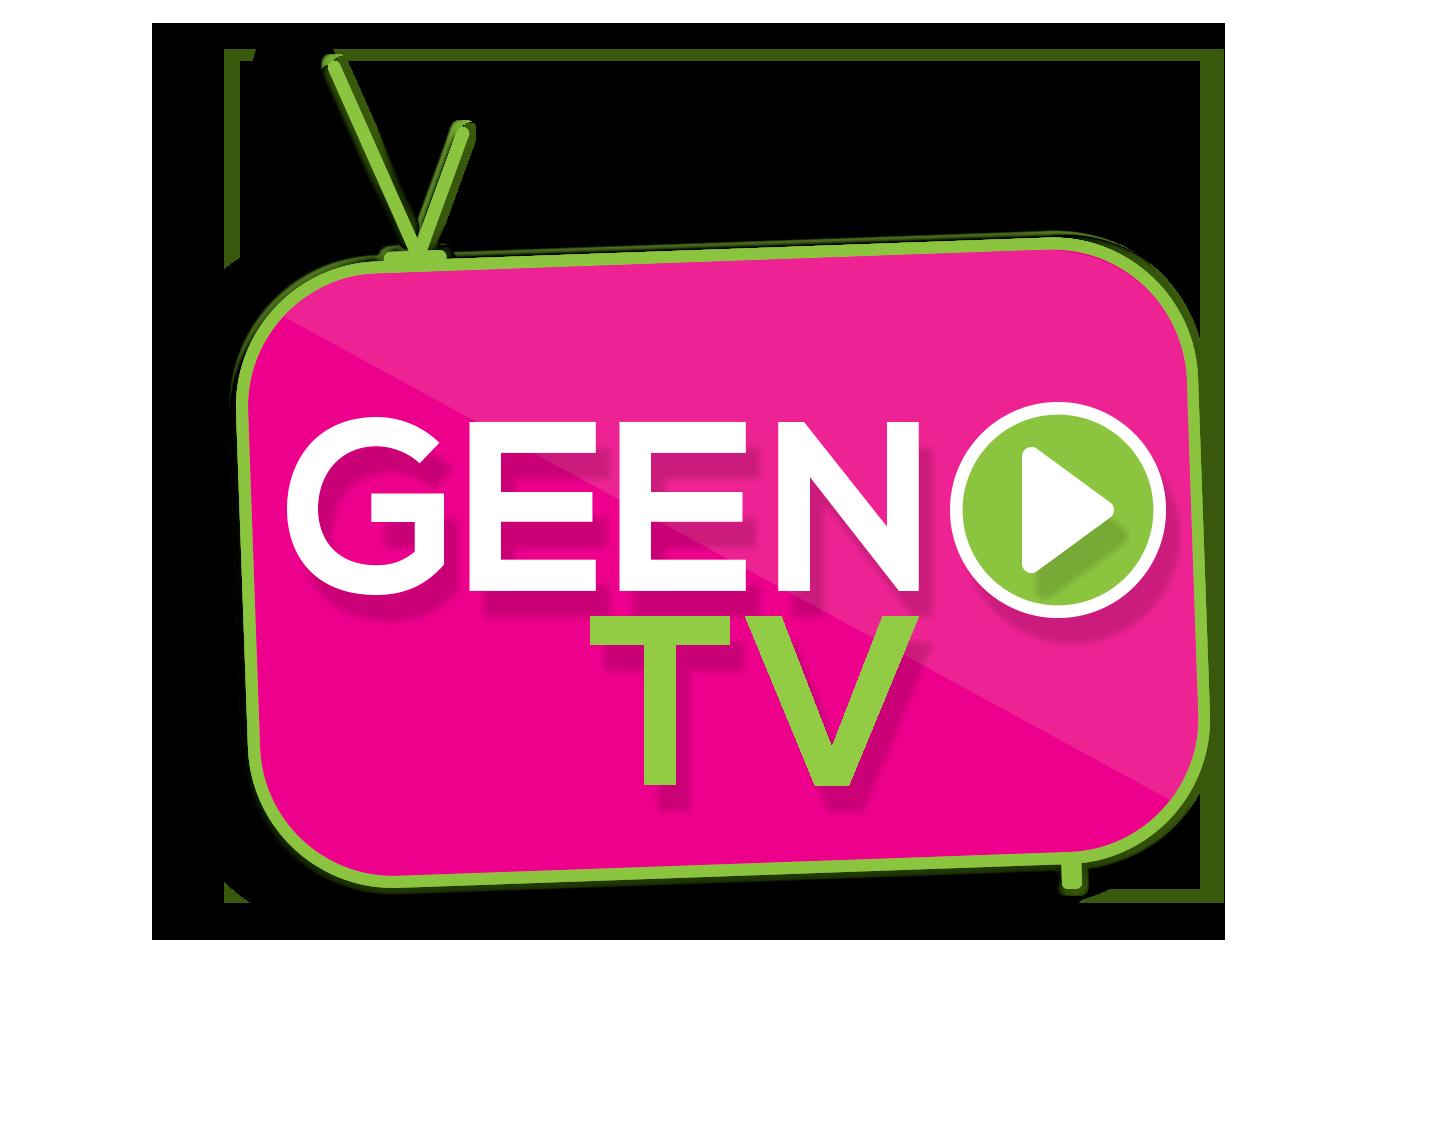 geentv-tvgroen-transparant